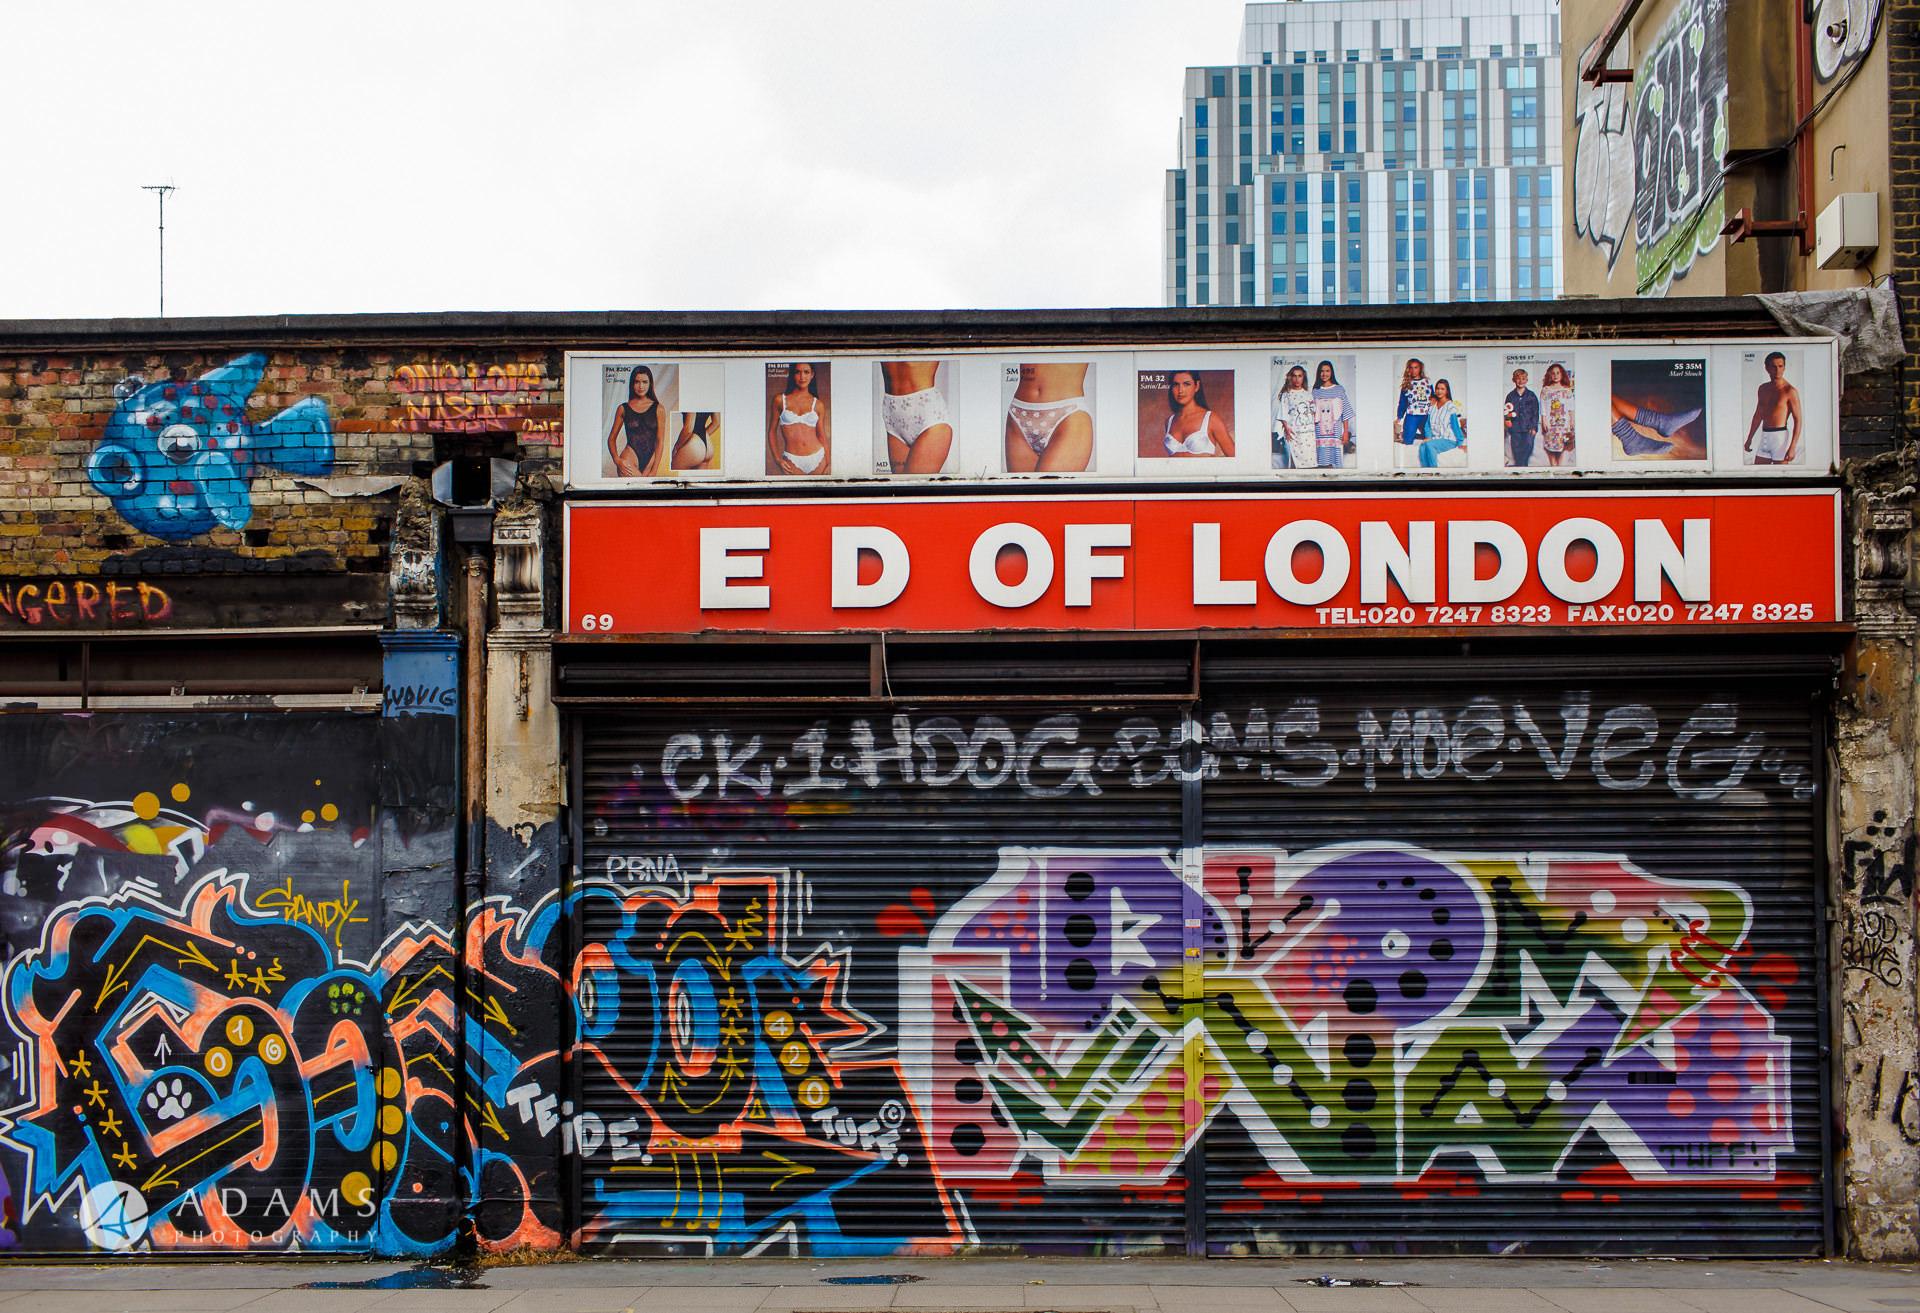 Ed of London Shop